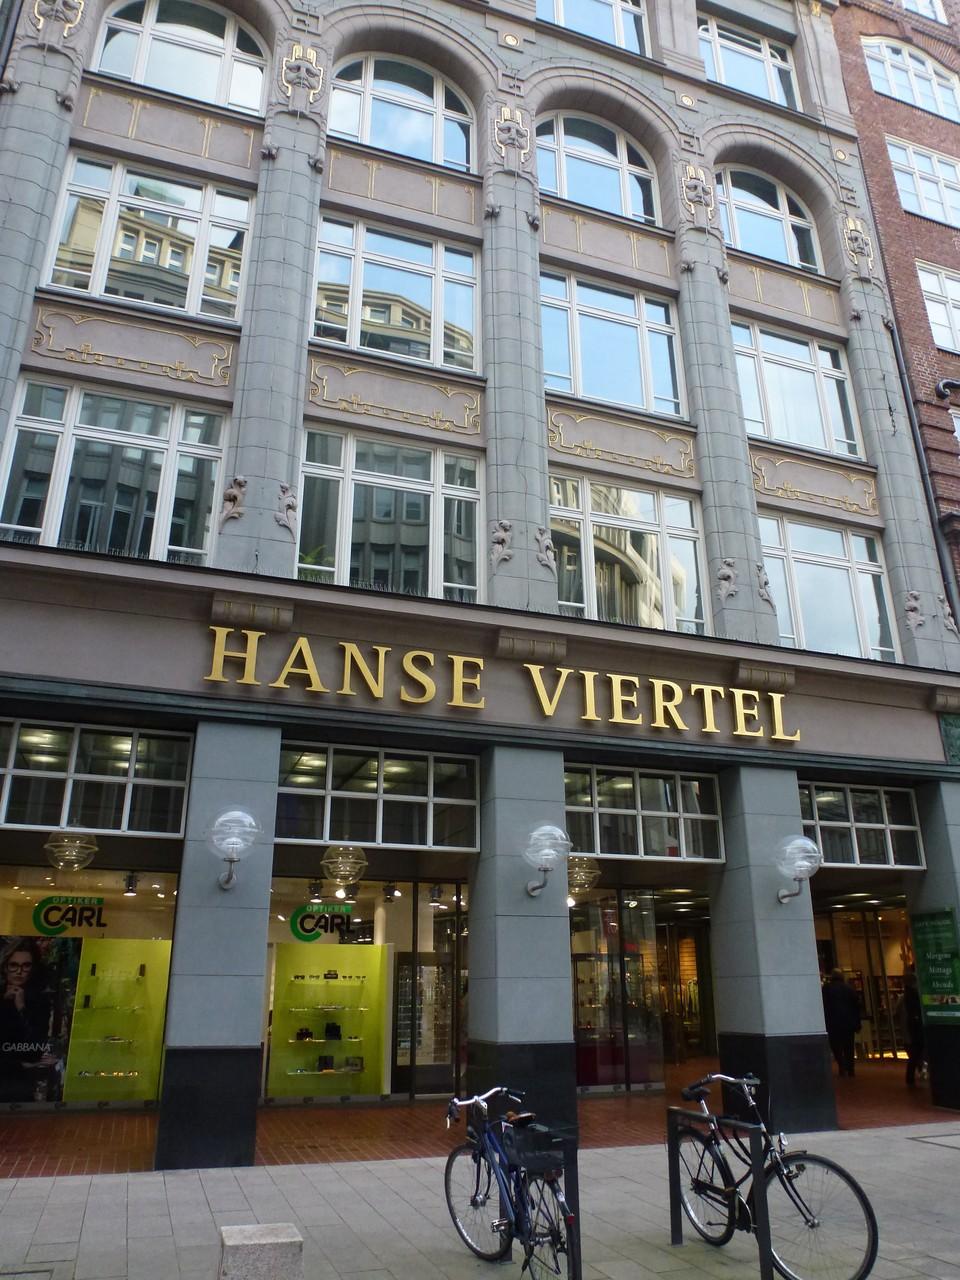 Hanse Viertel